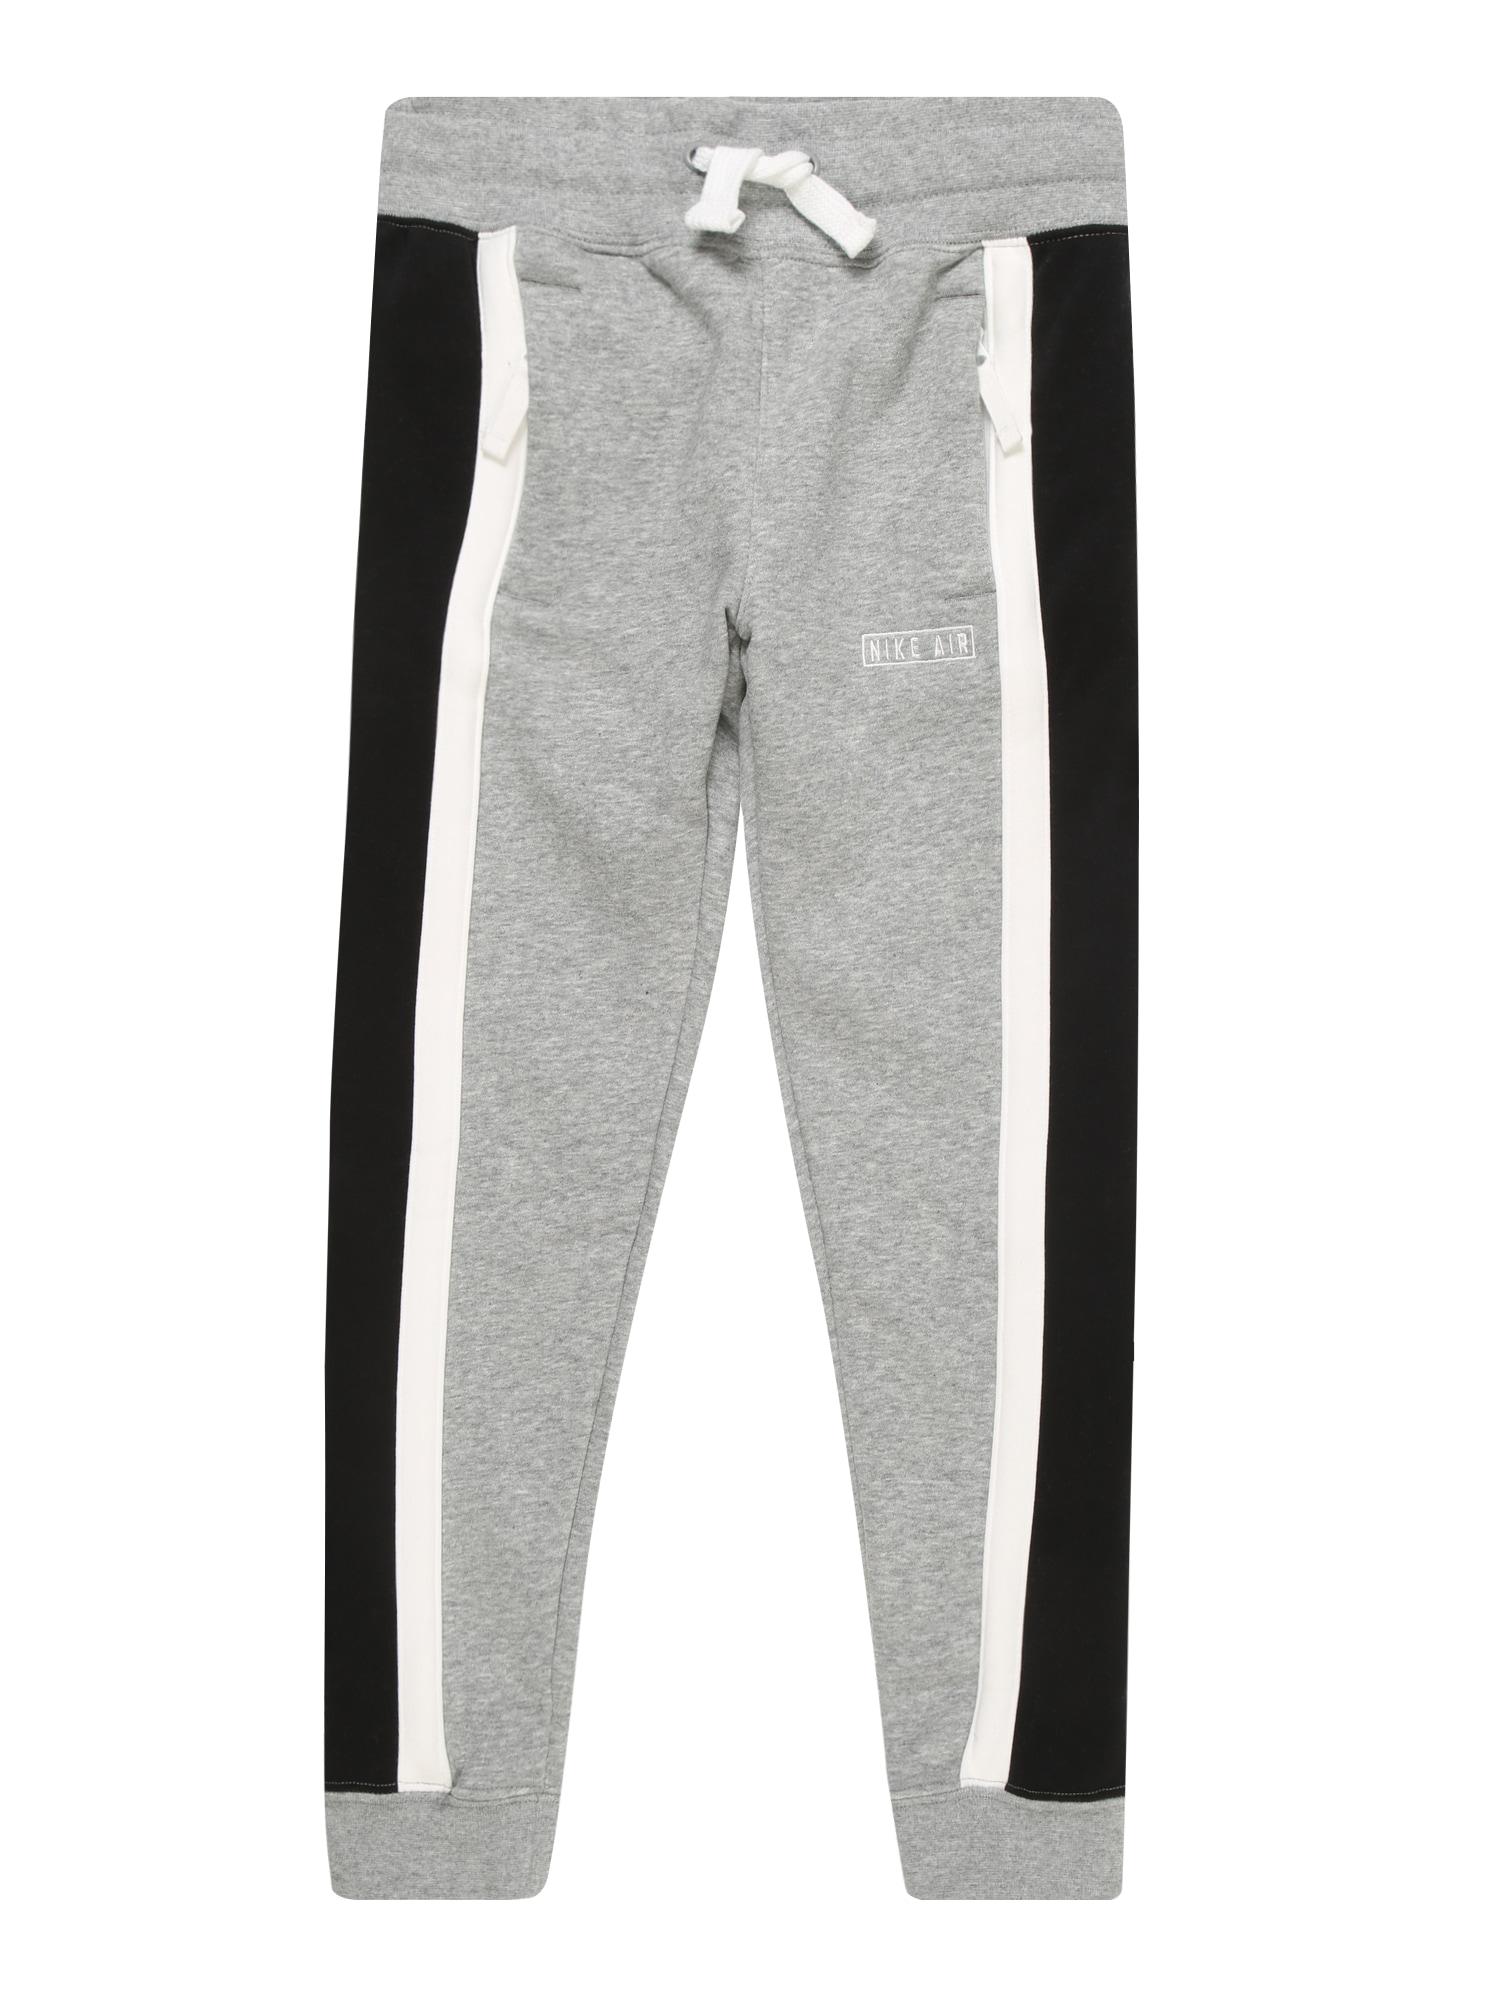 Nike Sportswear Kelnės pilka / juoda / balta